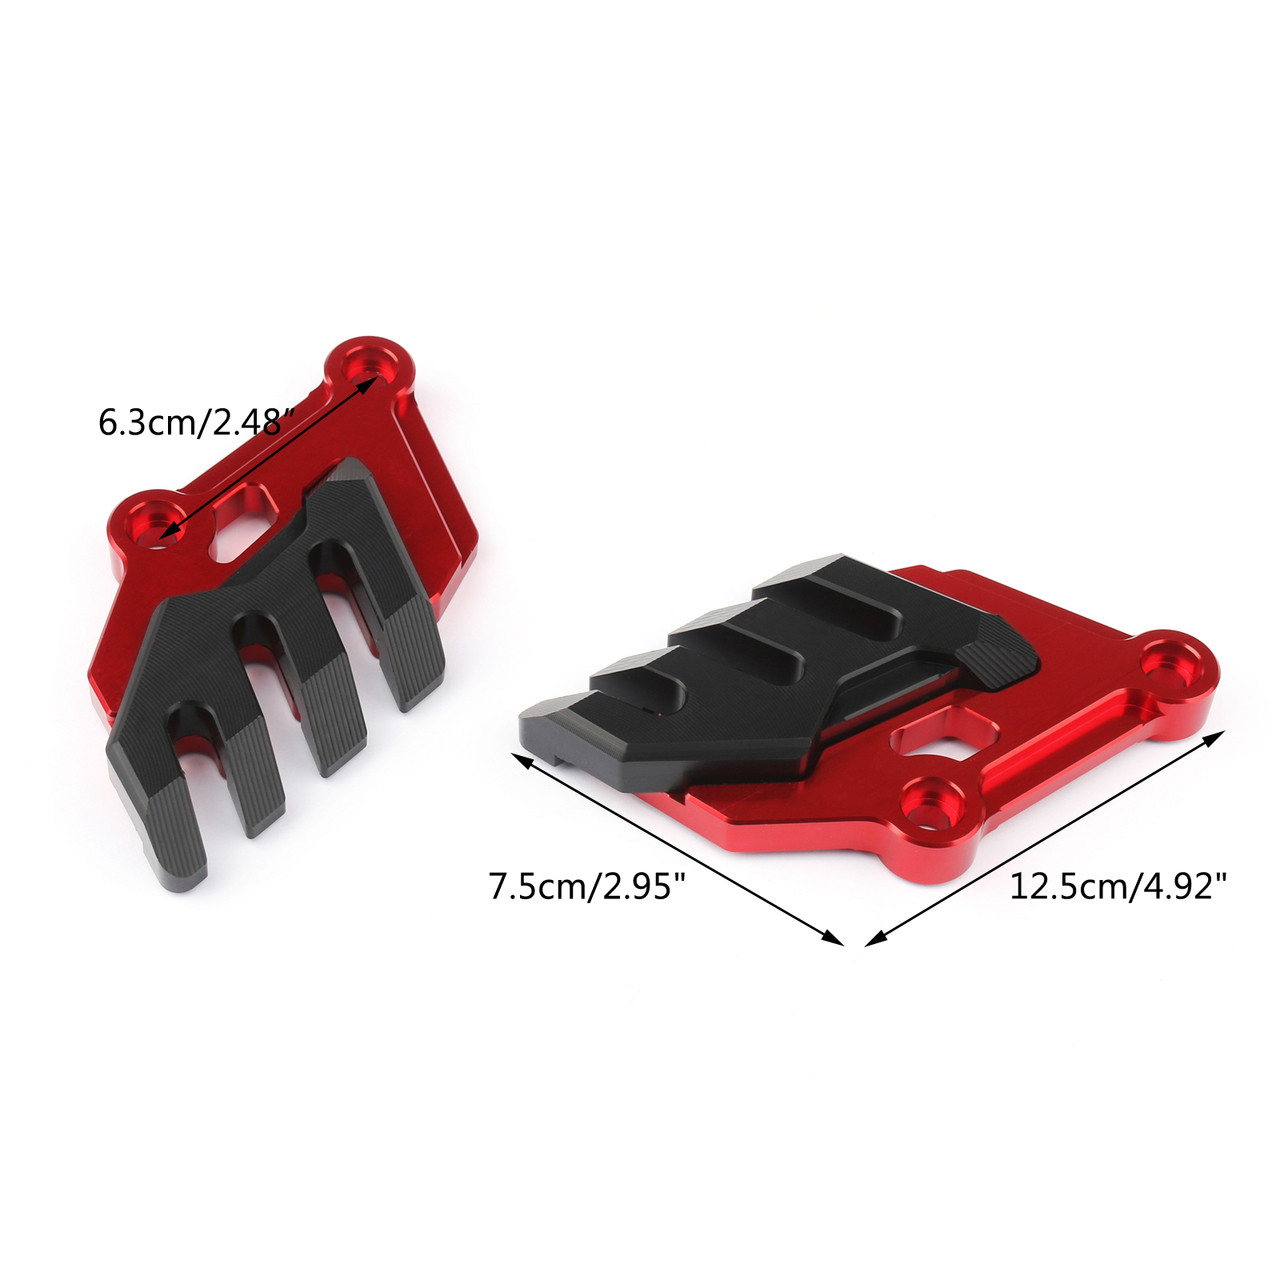 Front Brake Caliper Cover Disc Caliper Protector Cover For Kawasaki Z900 (2017-2019) Red